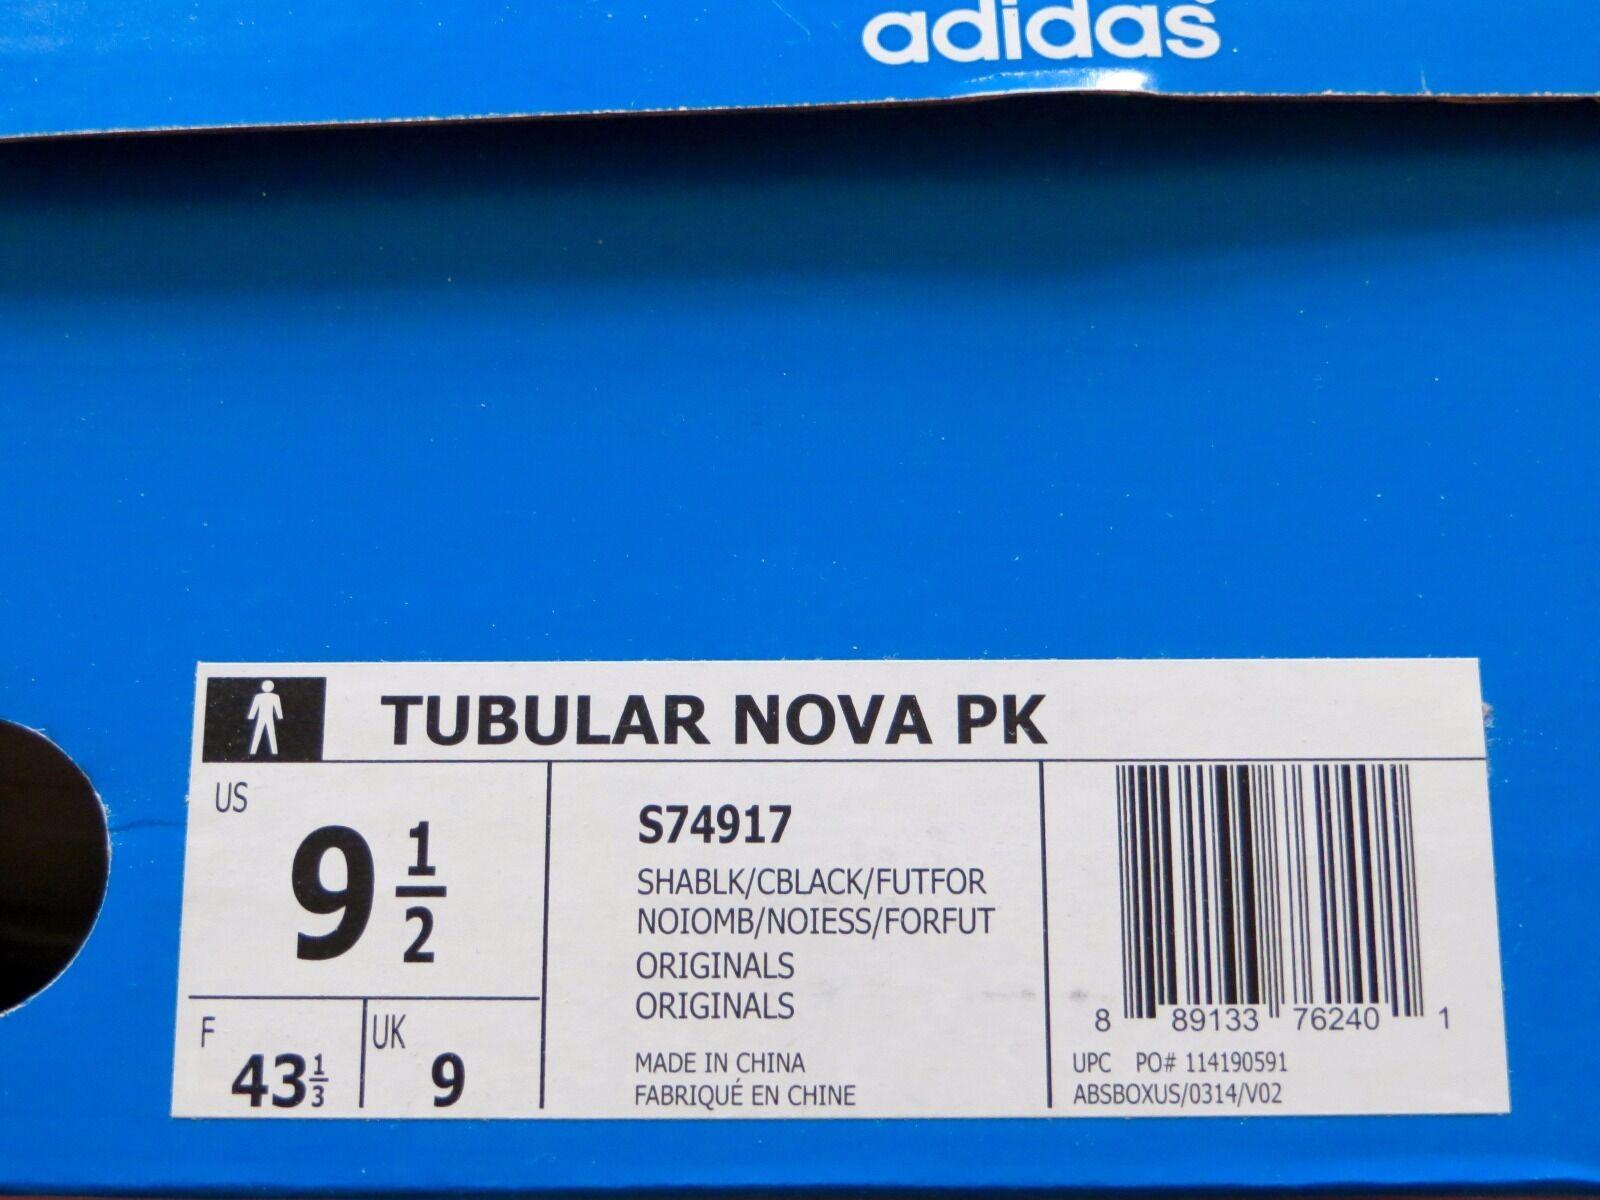 Adidas Adidas Adidas Tubular Nova PK Primeknit Shadow nero Forest S74917 Uomo Dimensione 9.5 794911